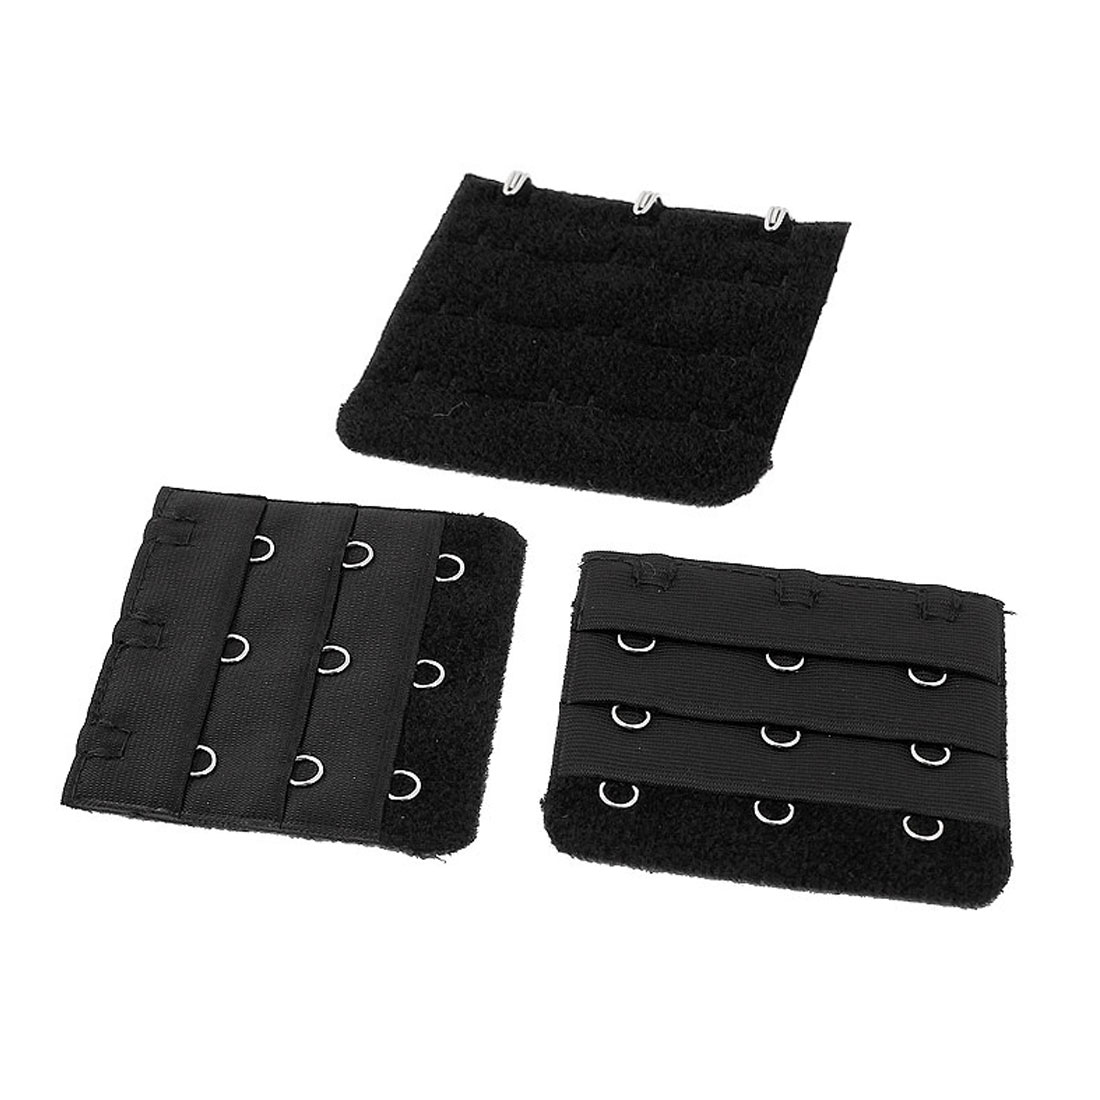 Lady 3 x 3 Hooks Brassiere Bra Underwear Extension Strap Extender Black 3pcs